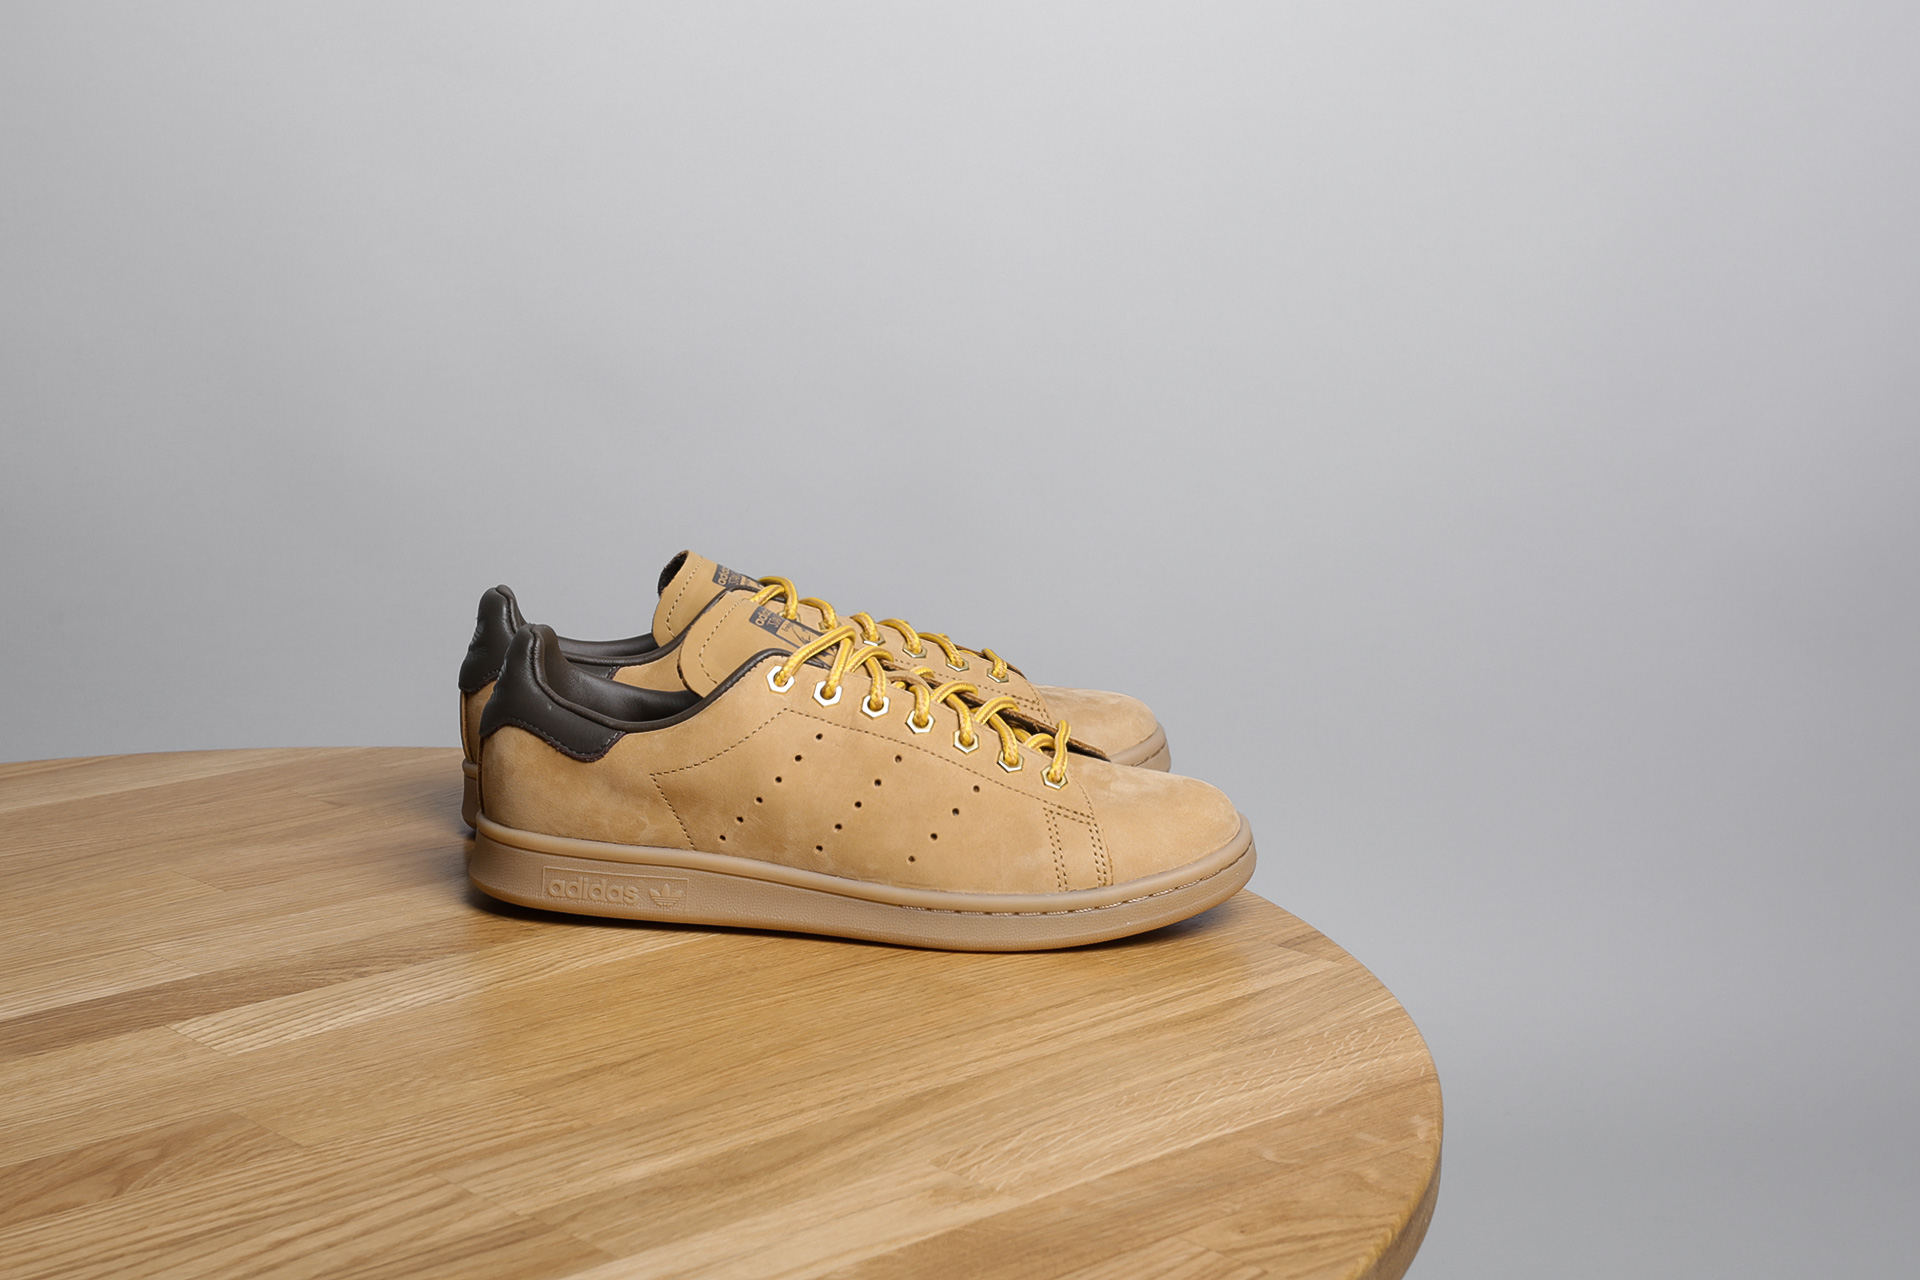 san francisco fc25a 179e1 Купить бежевые мужские кроссовки Stan Smith WP от adidas ...